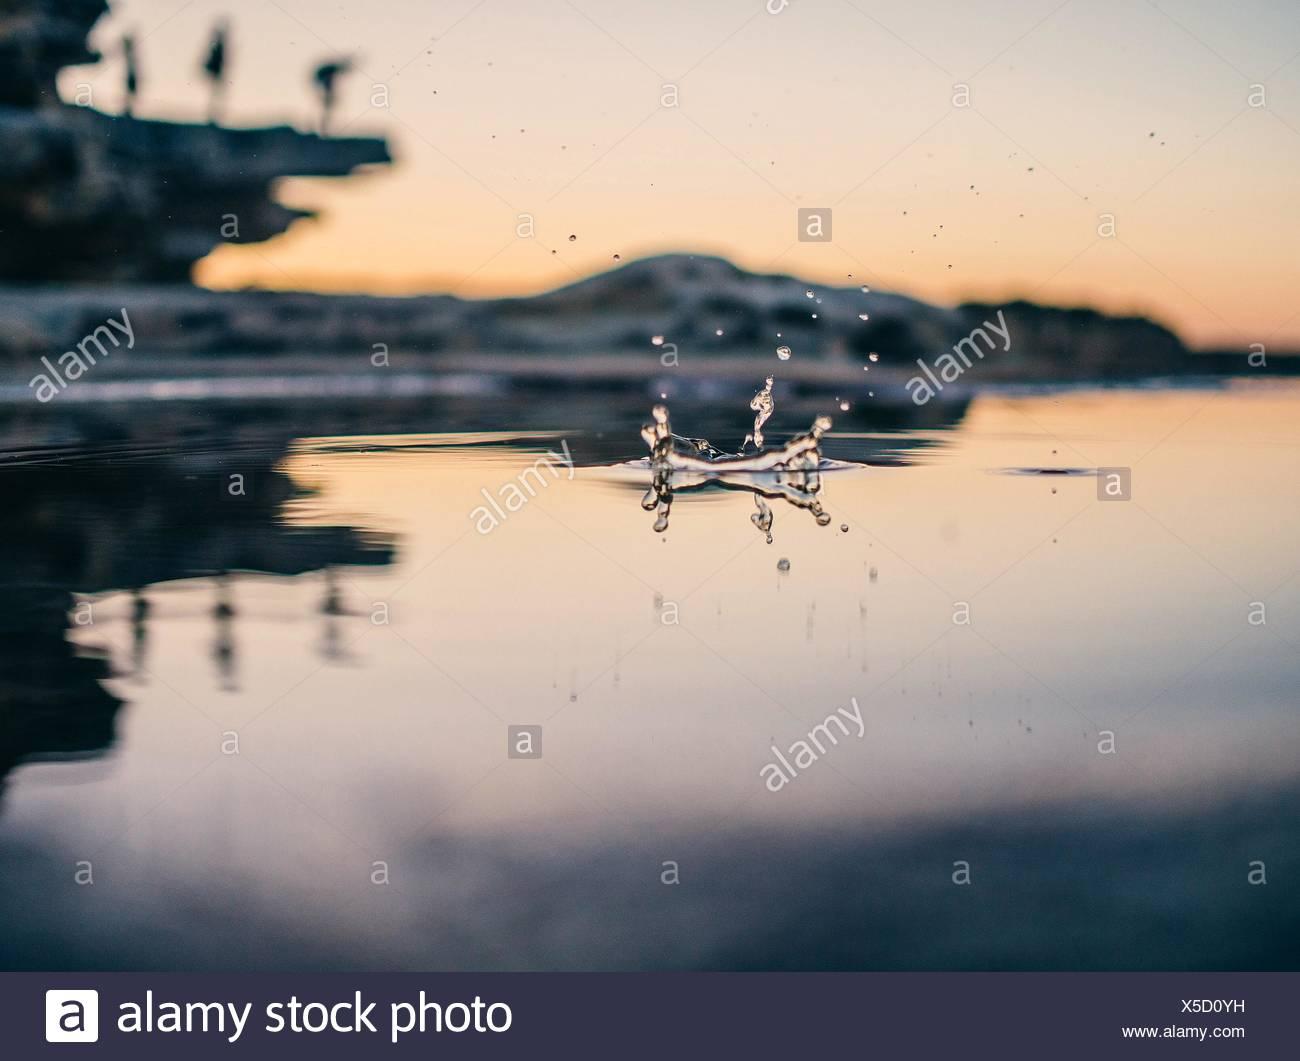 La superficie vista de gota caiga en el lago al atardecer Imagen De Stock